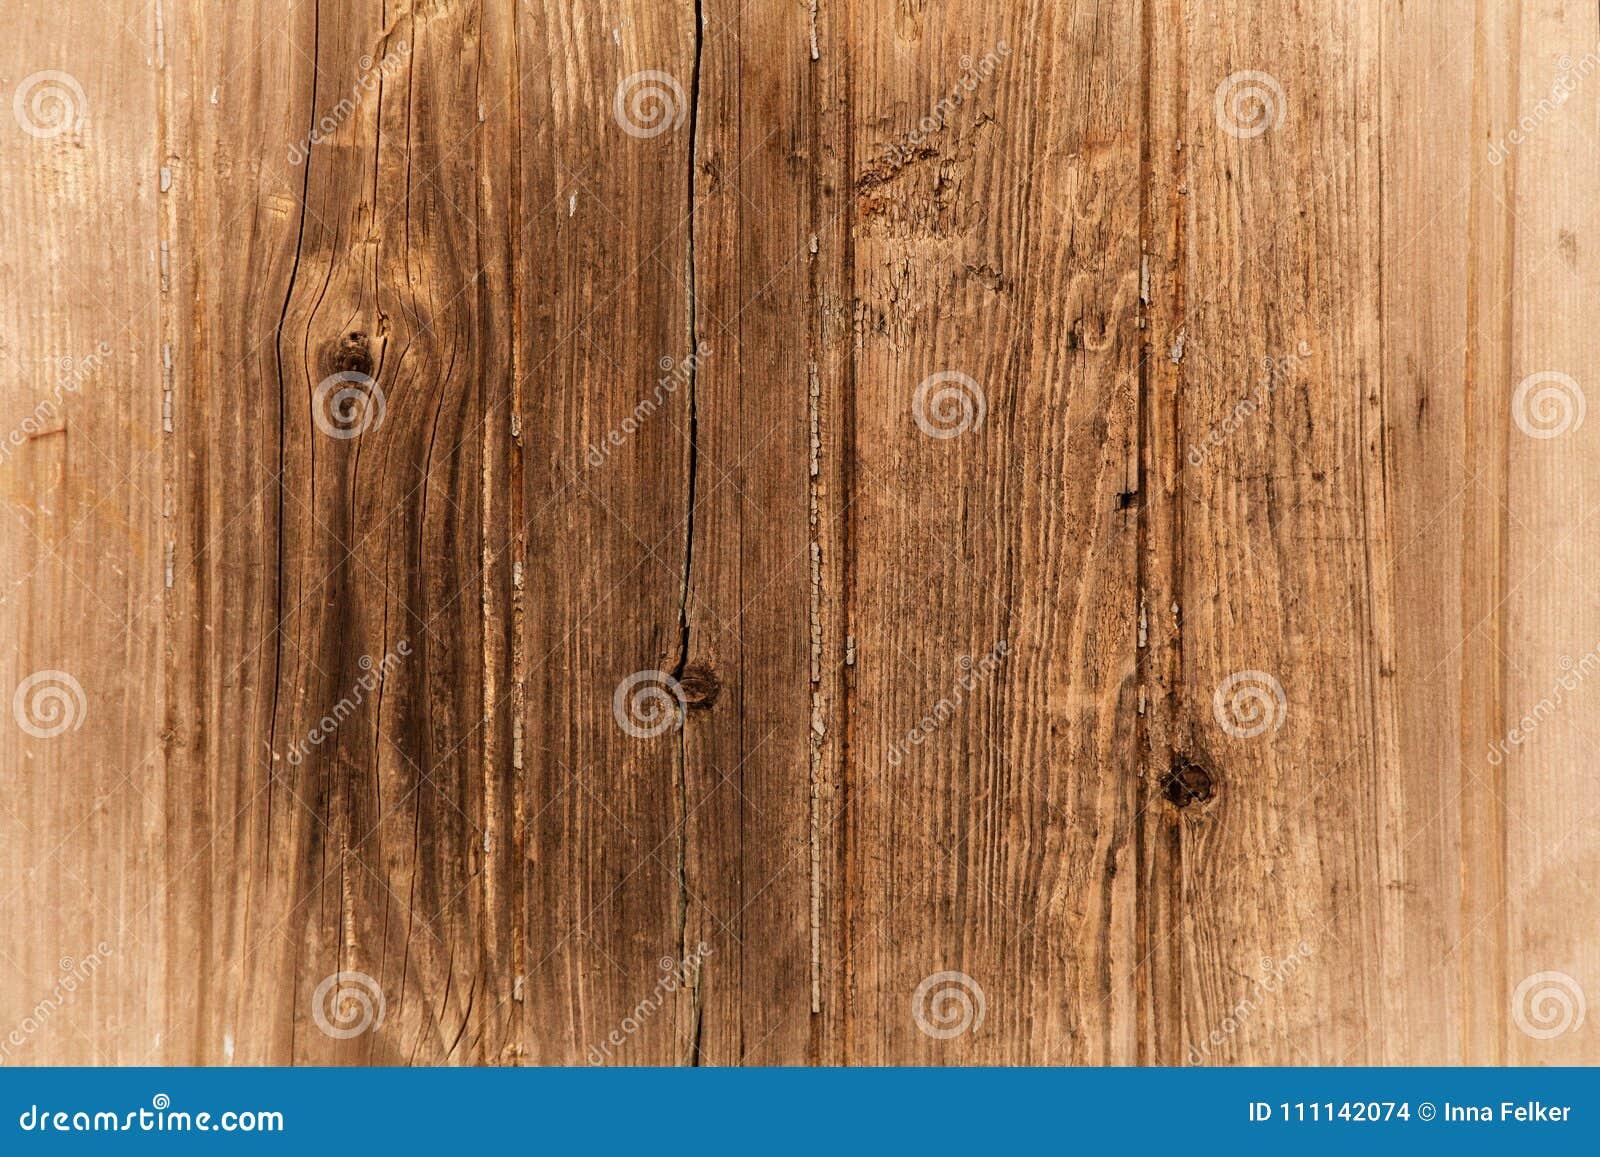 Old vintage wooden textured background